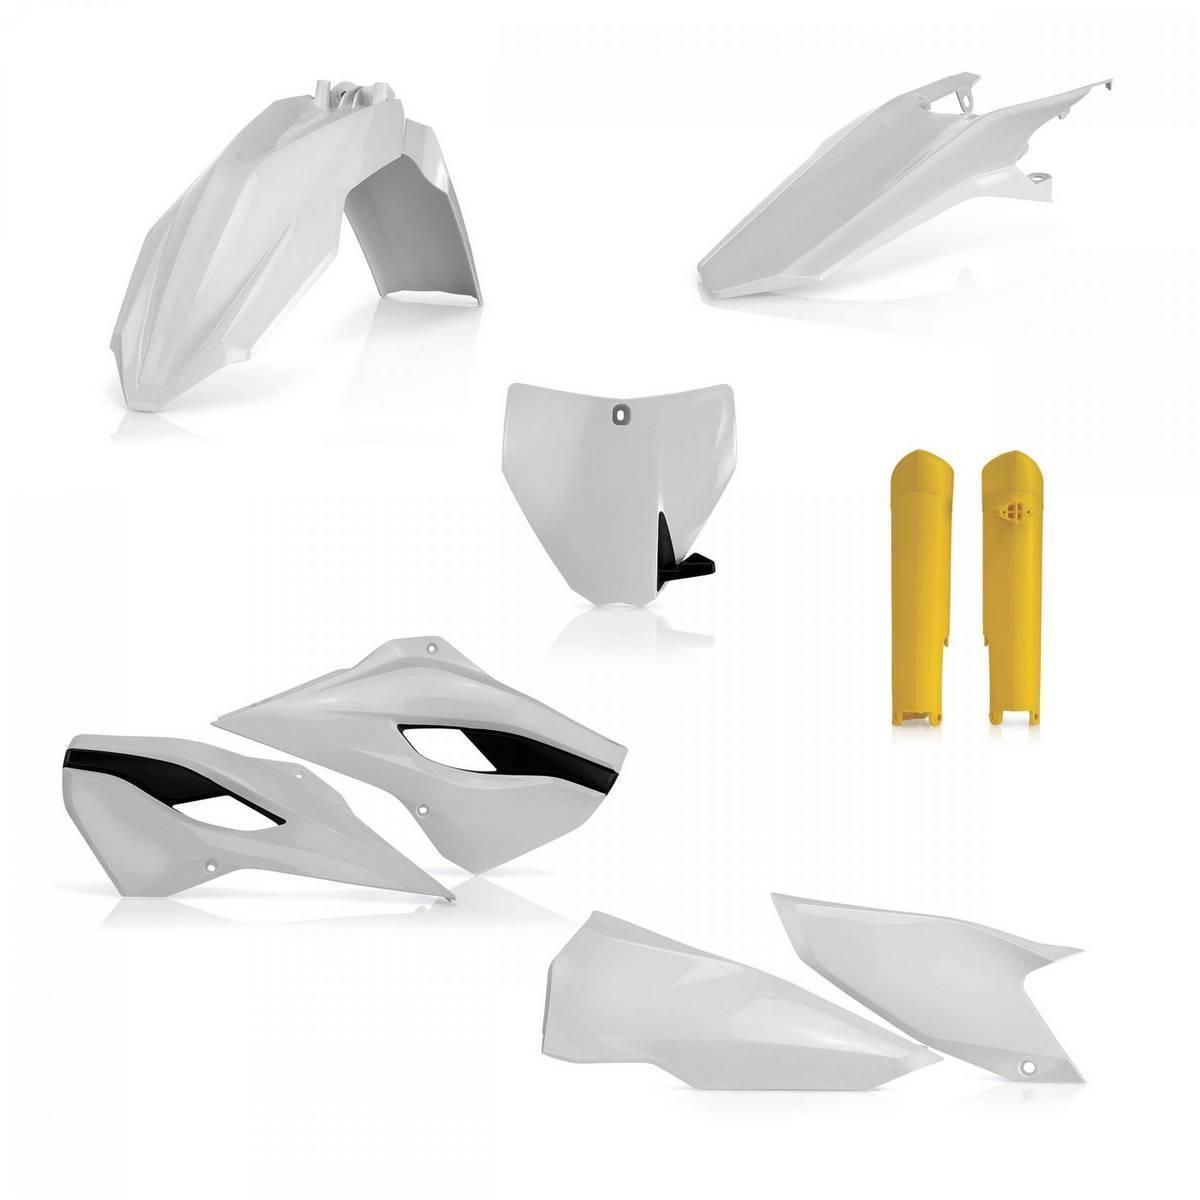 0017706-553 - Full Kit Plasticos Tc125 250 Fc250 350 450 14 15 Origen